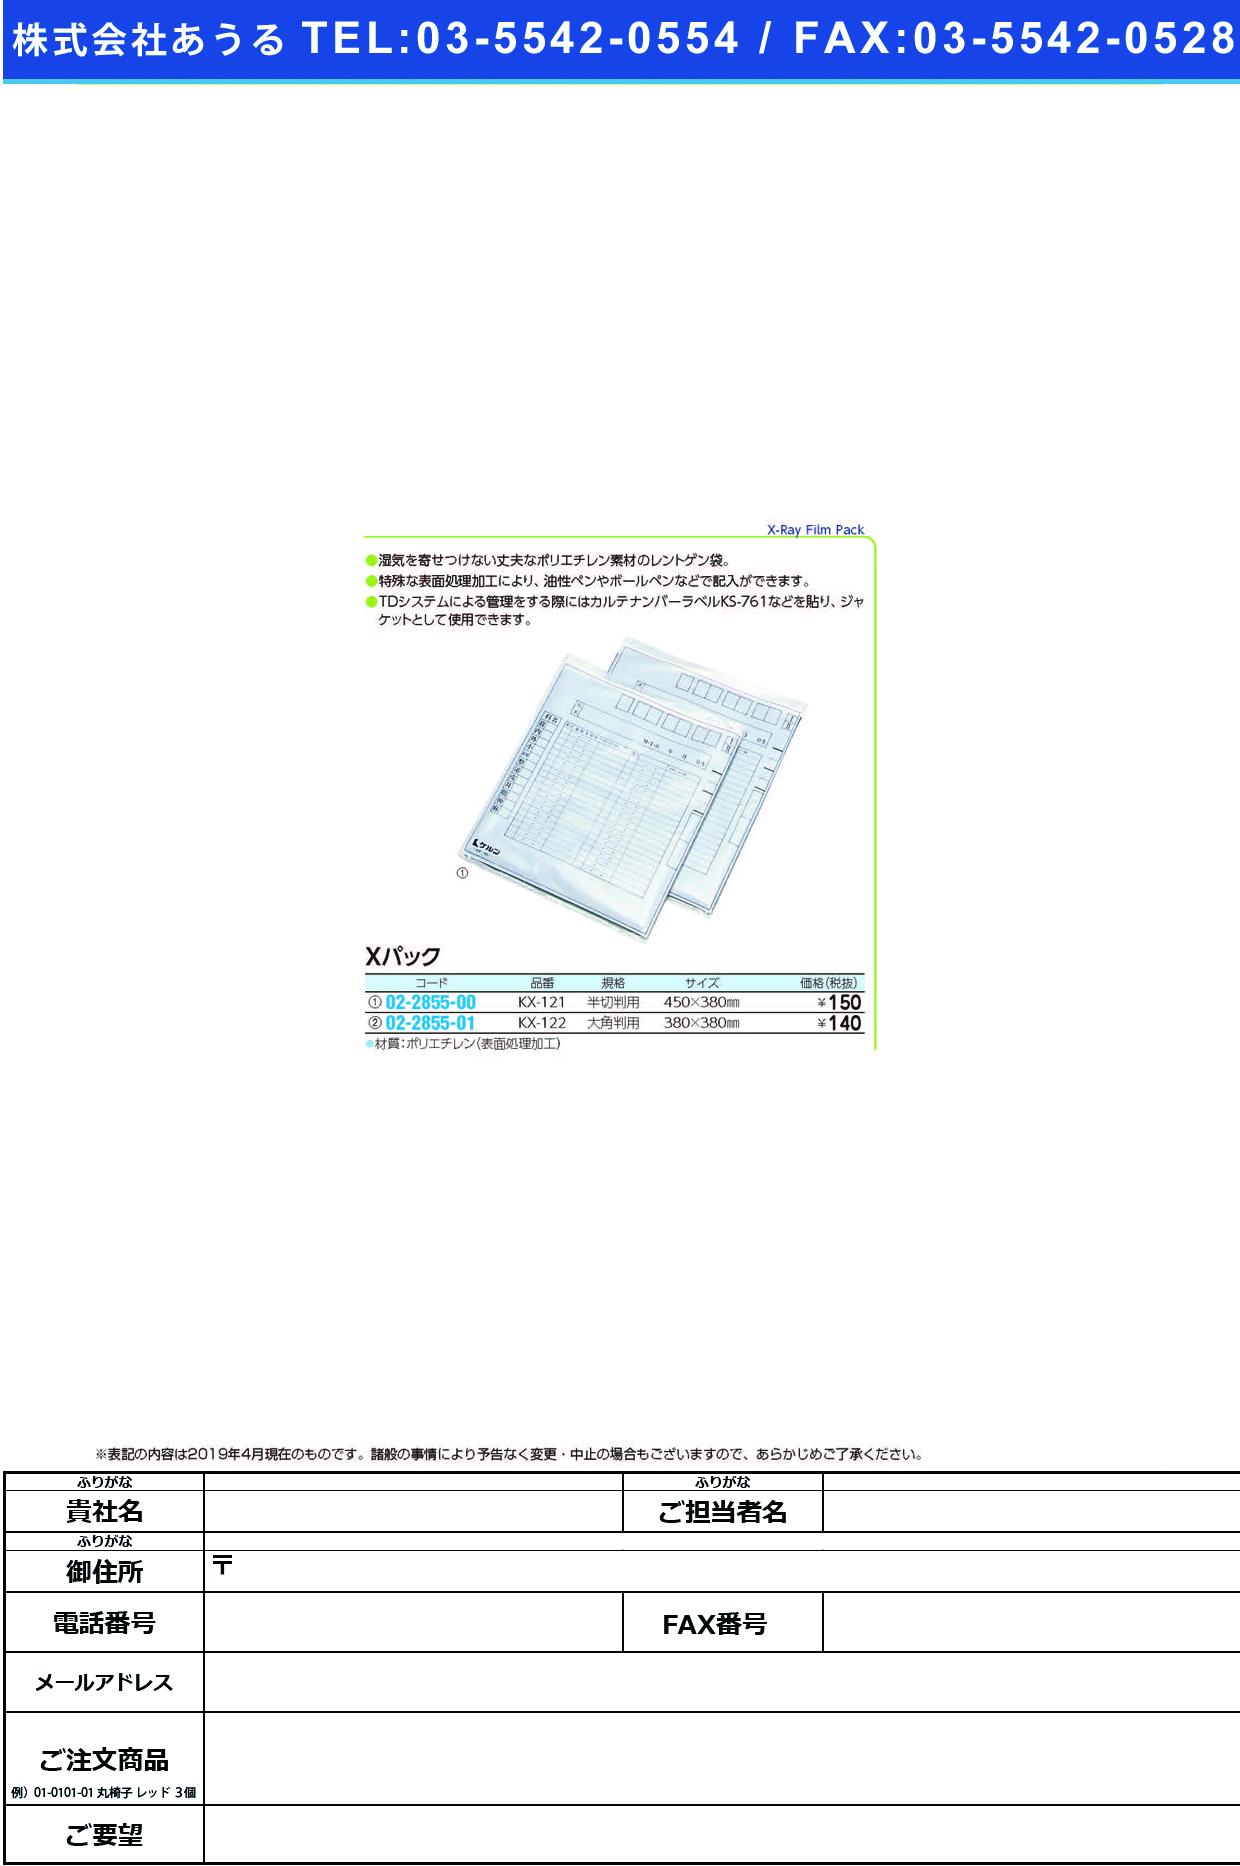 (02-2855-01)Xパック(大角判用) KX-122 KX122(ケルン)【1枚単位】【2019年カタログ商品】